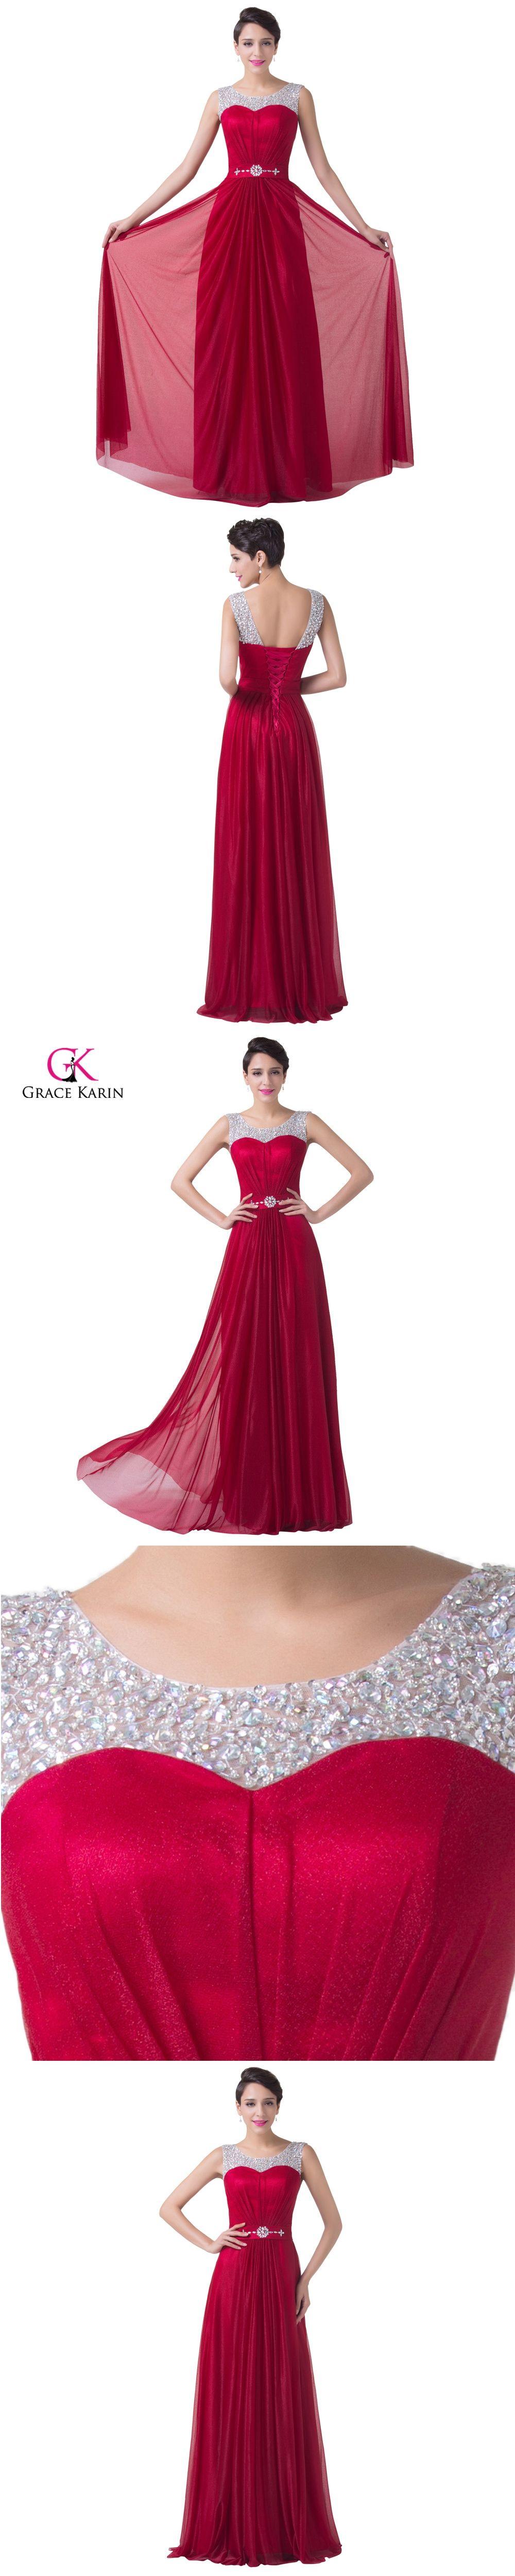 Burgundy prom dresses grace karin elegant sequins beaded lace